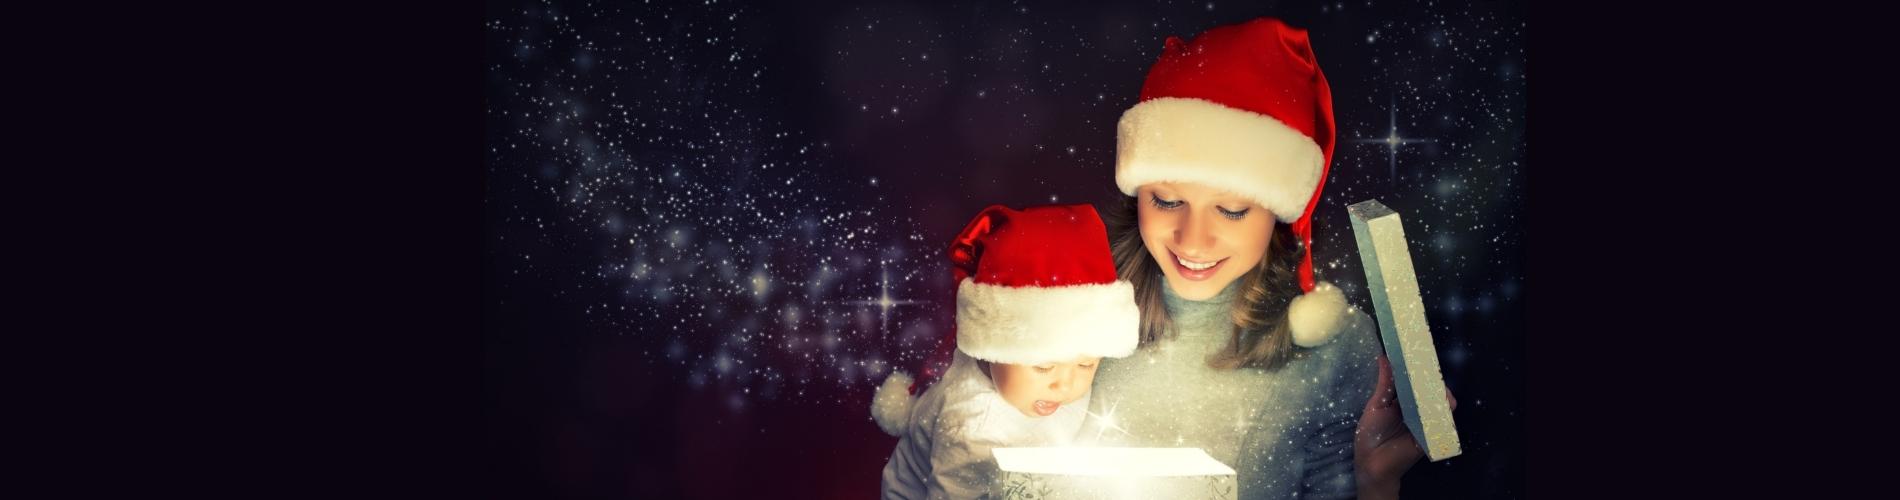 Box Cadeau Premier Noël Maman Bébé